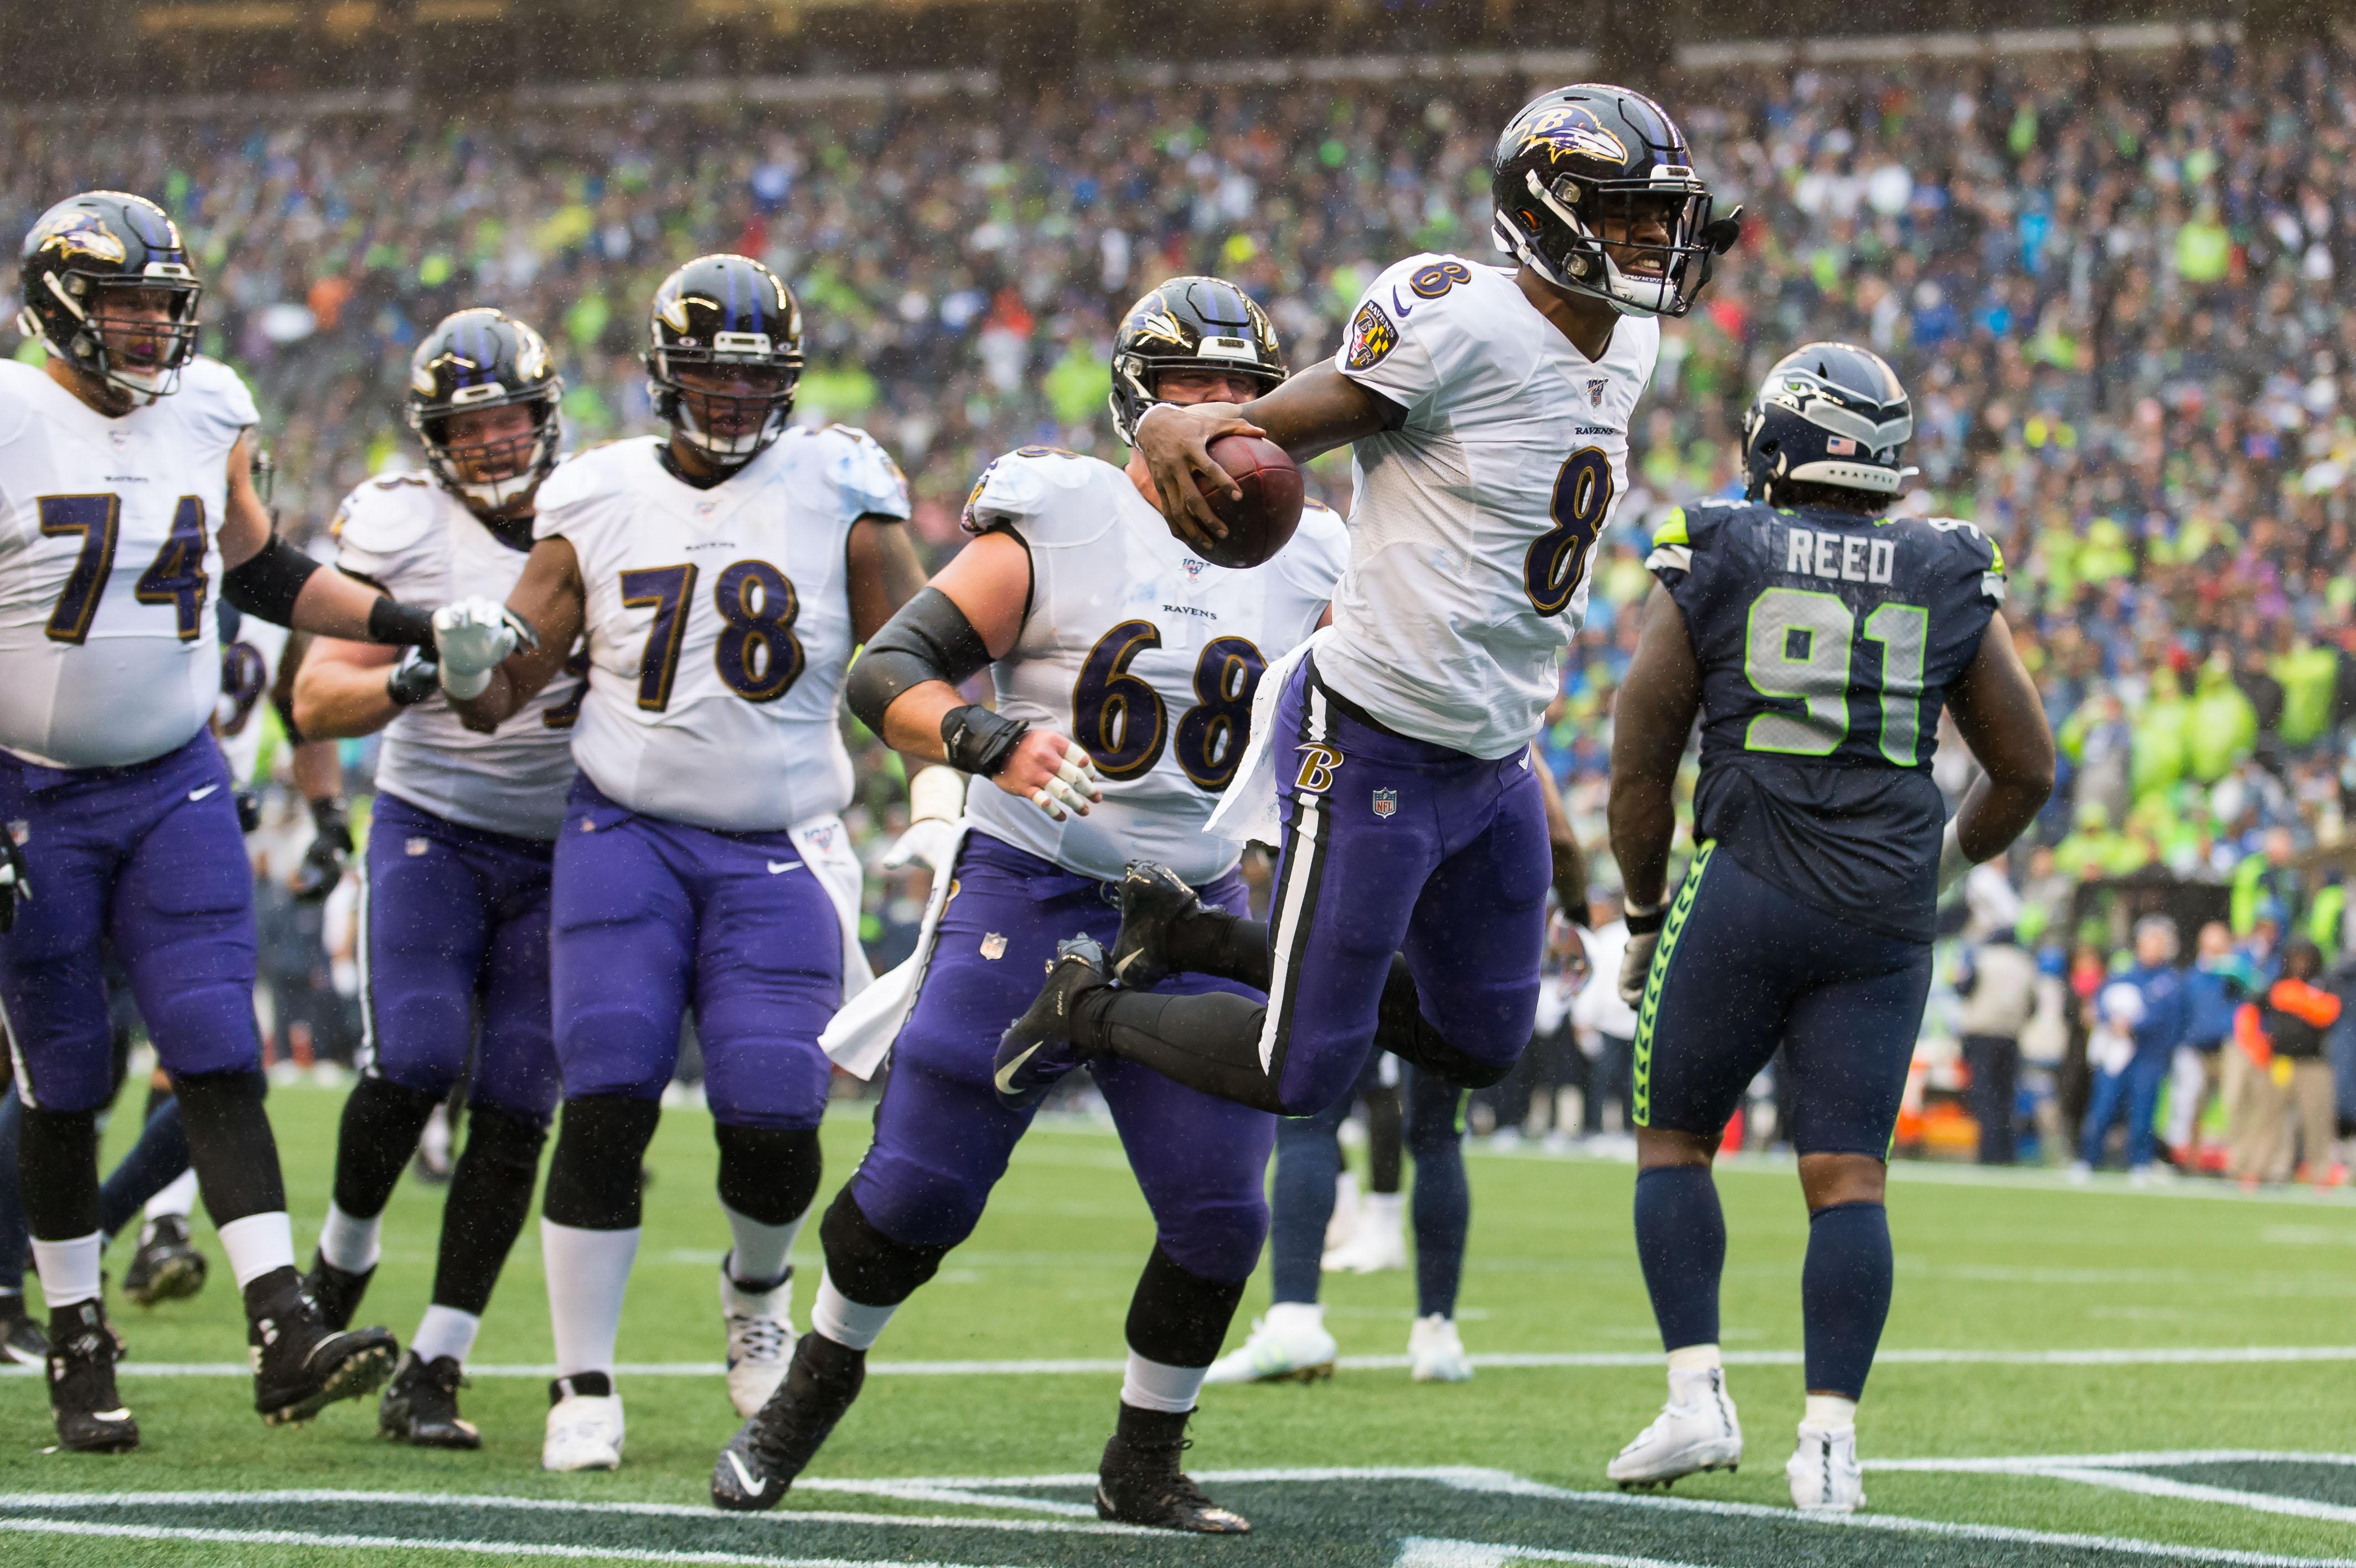 NFL: Baltimore Ravens at Seattle Seahawks